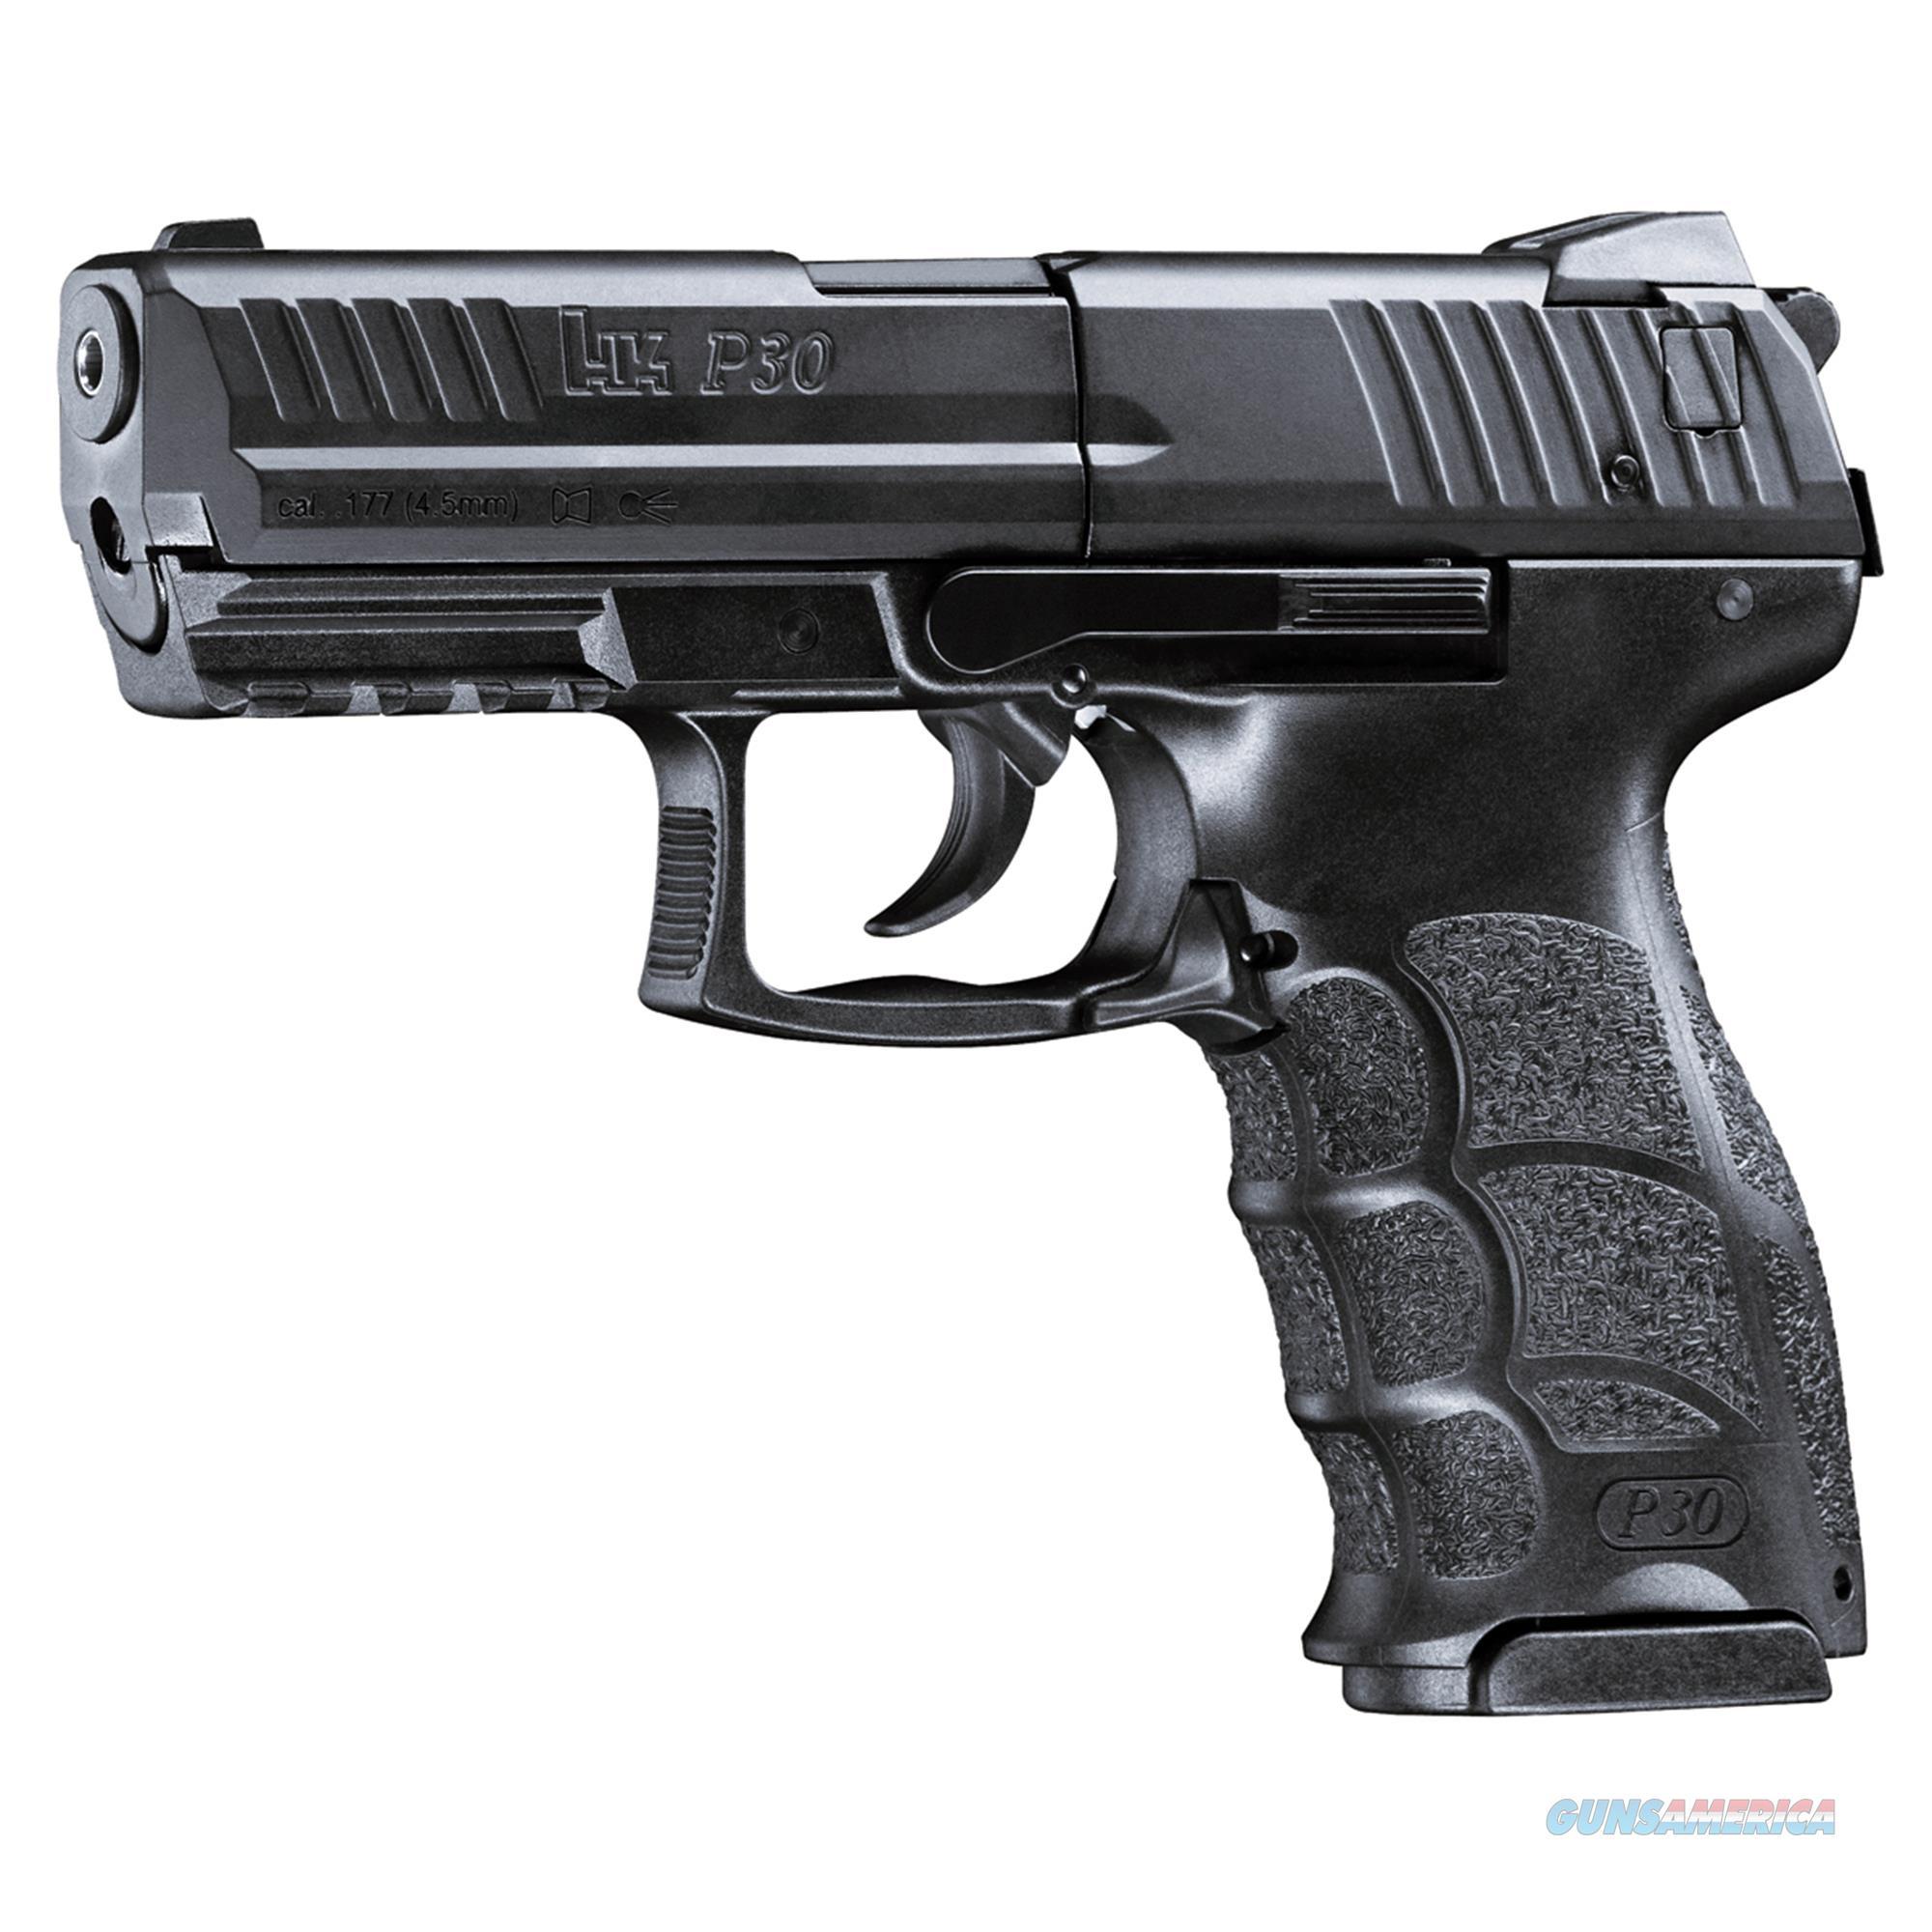 Umarex H&K P30 Black (Pellets/Bb's) .177 2252302  Non-Guns > Air Rifles - Pistols > CO2 Rifle